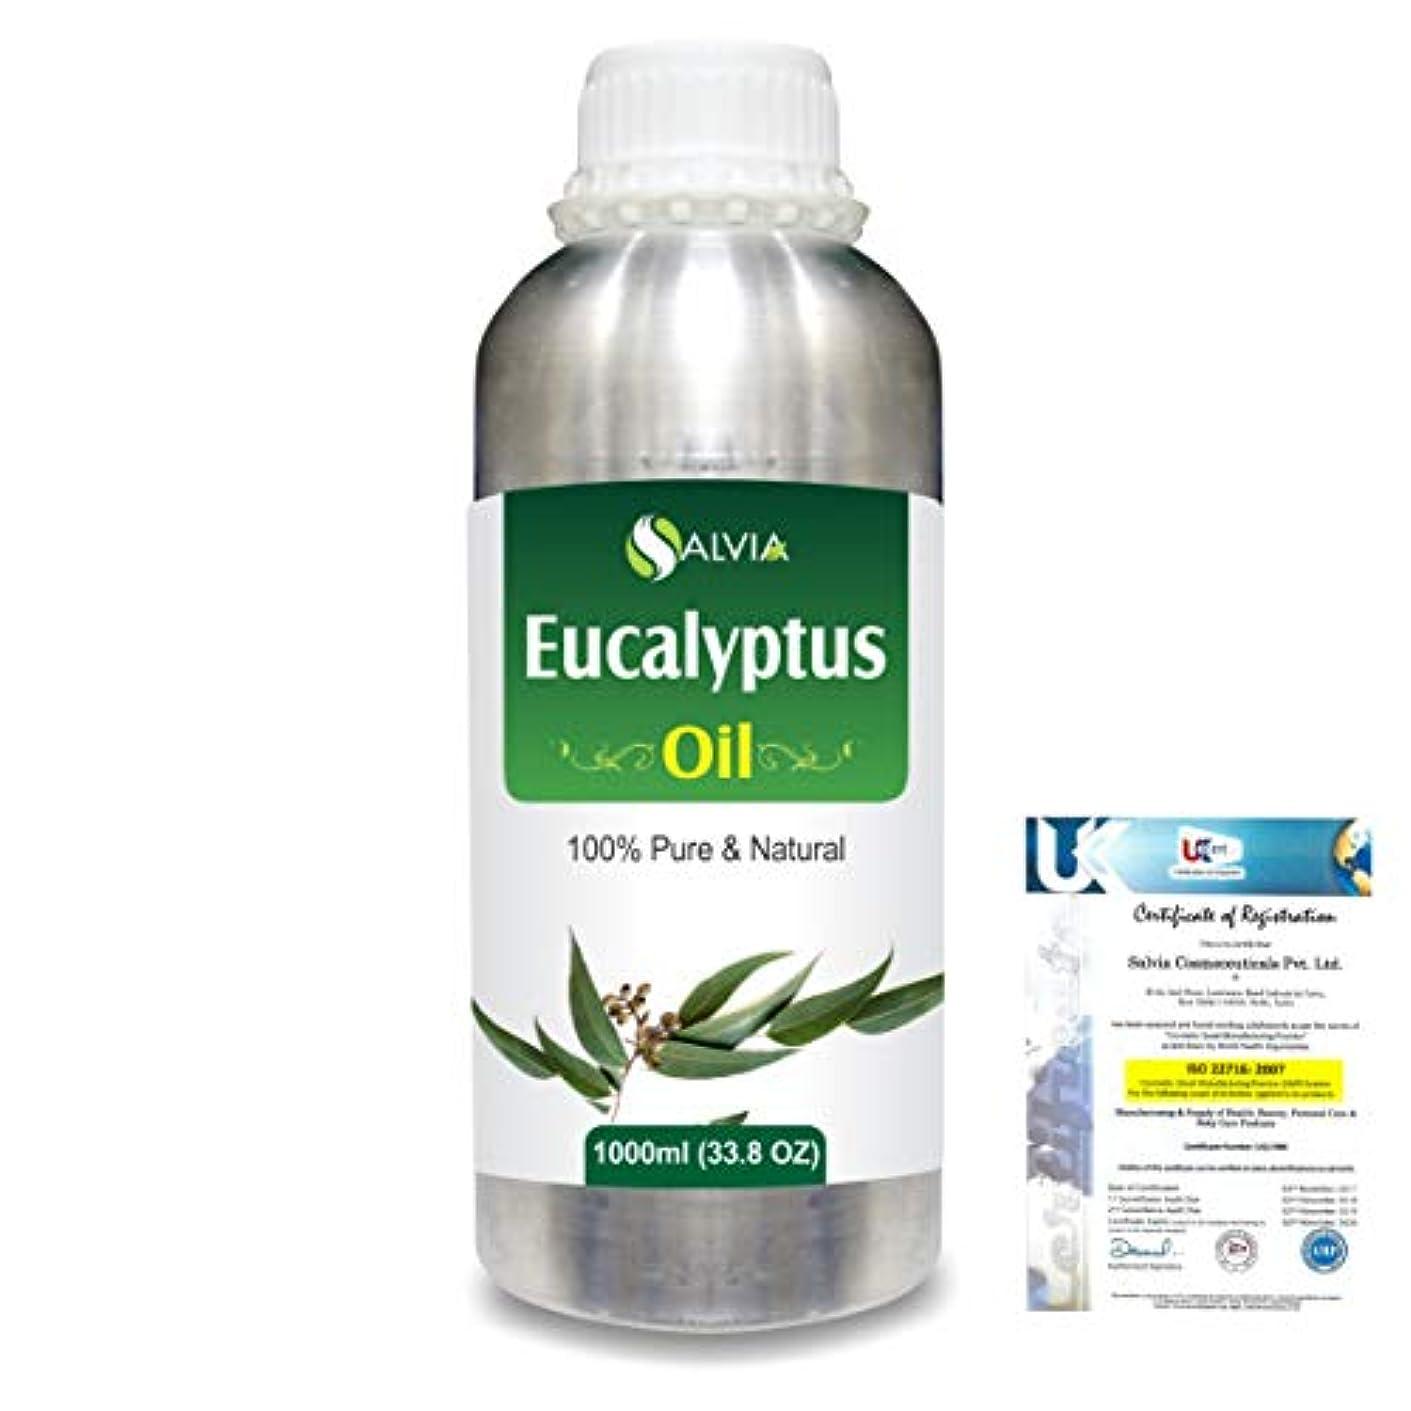 思慮深い平日暴露Eucalyptus (Eucalyptus Globulus) 100% Natural Pure Essential Oil 1000ml/33.8fl.oz.